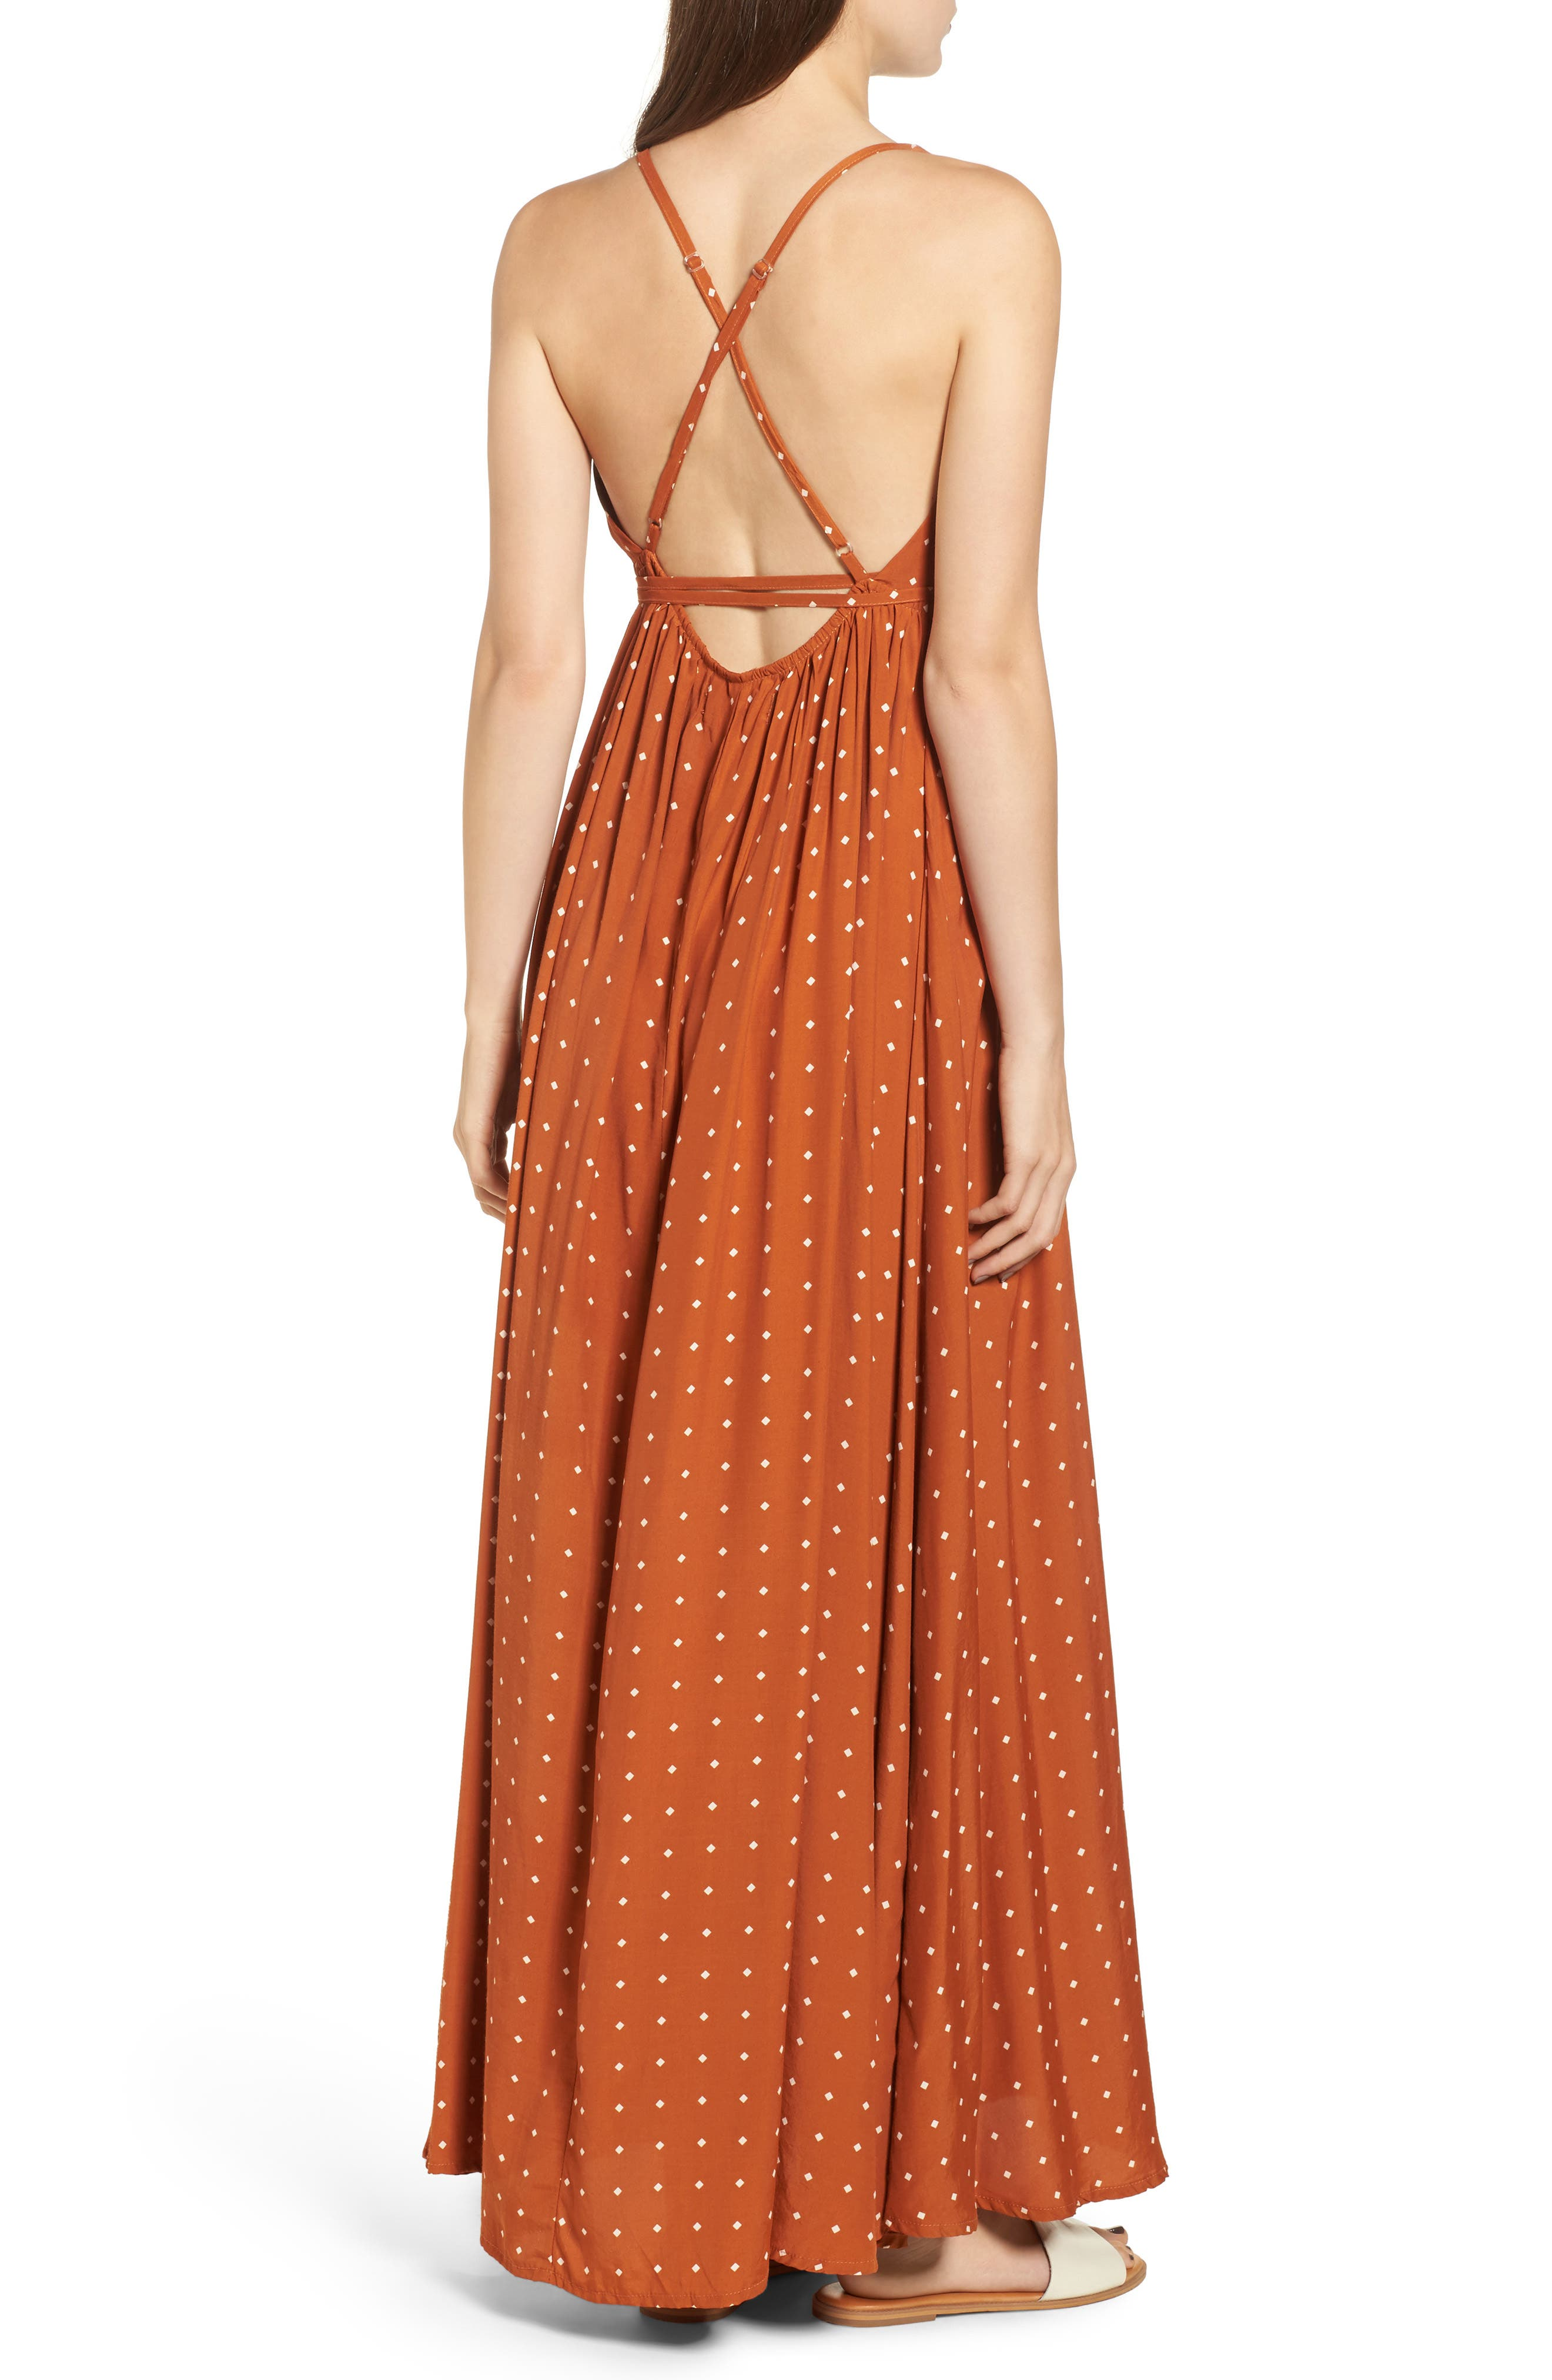 Santa Rosa Maxi Dress,                             Alternate thumbnail 2, color,                             Stefano Print - Ginger